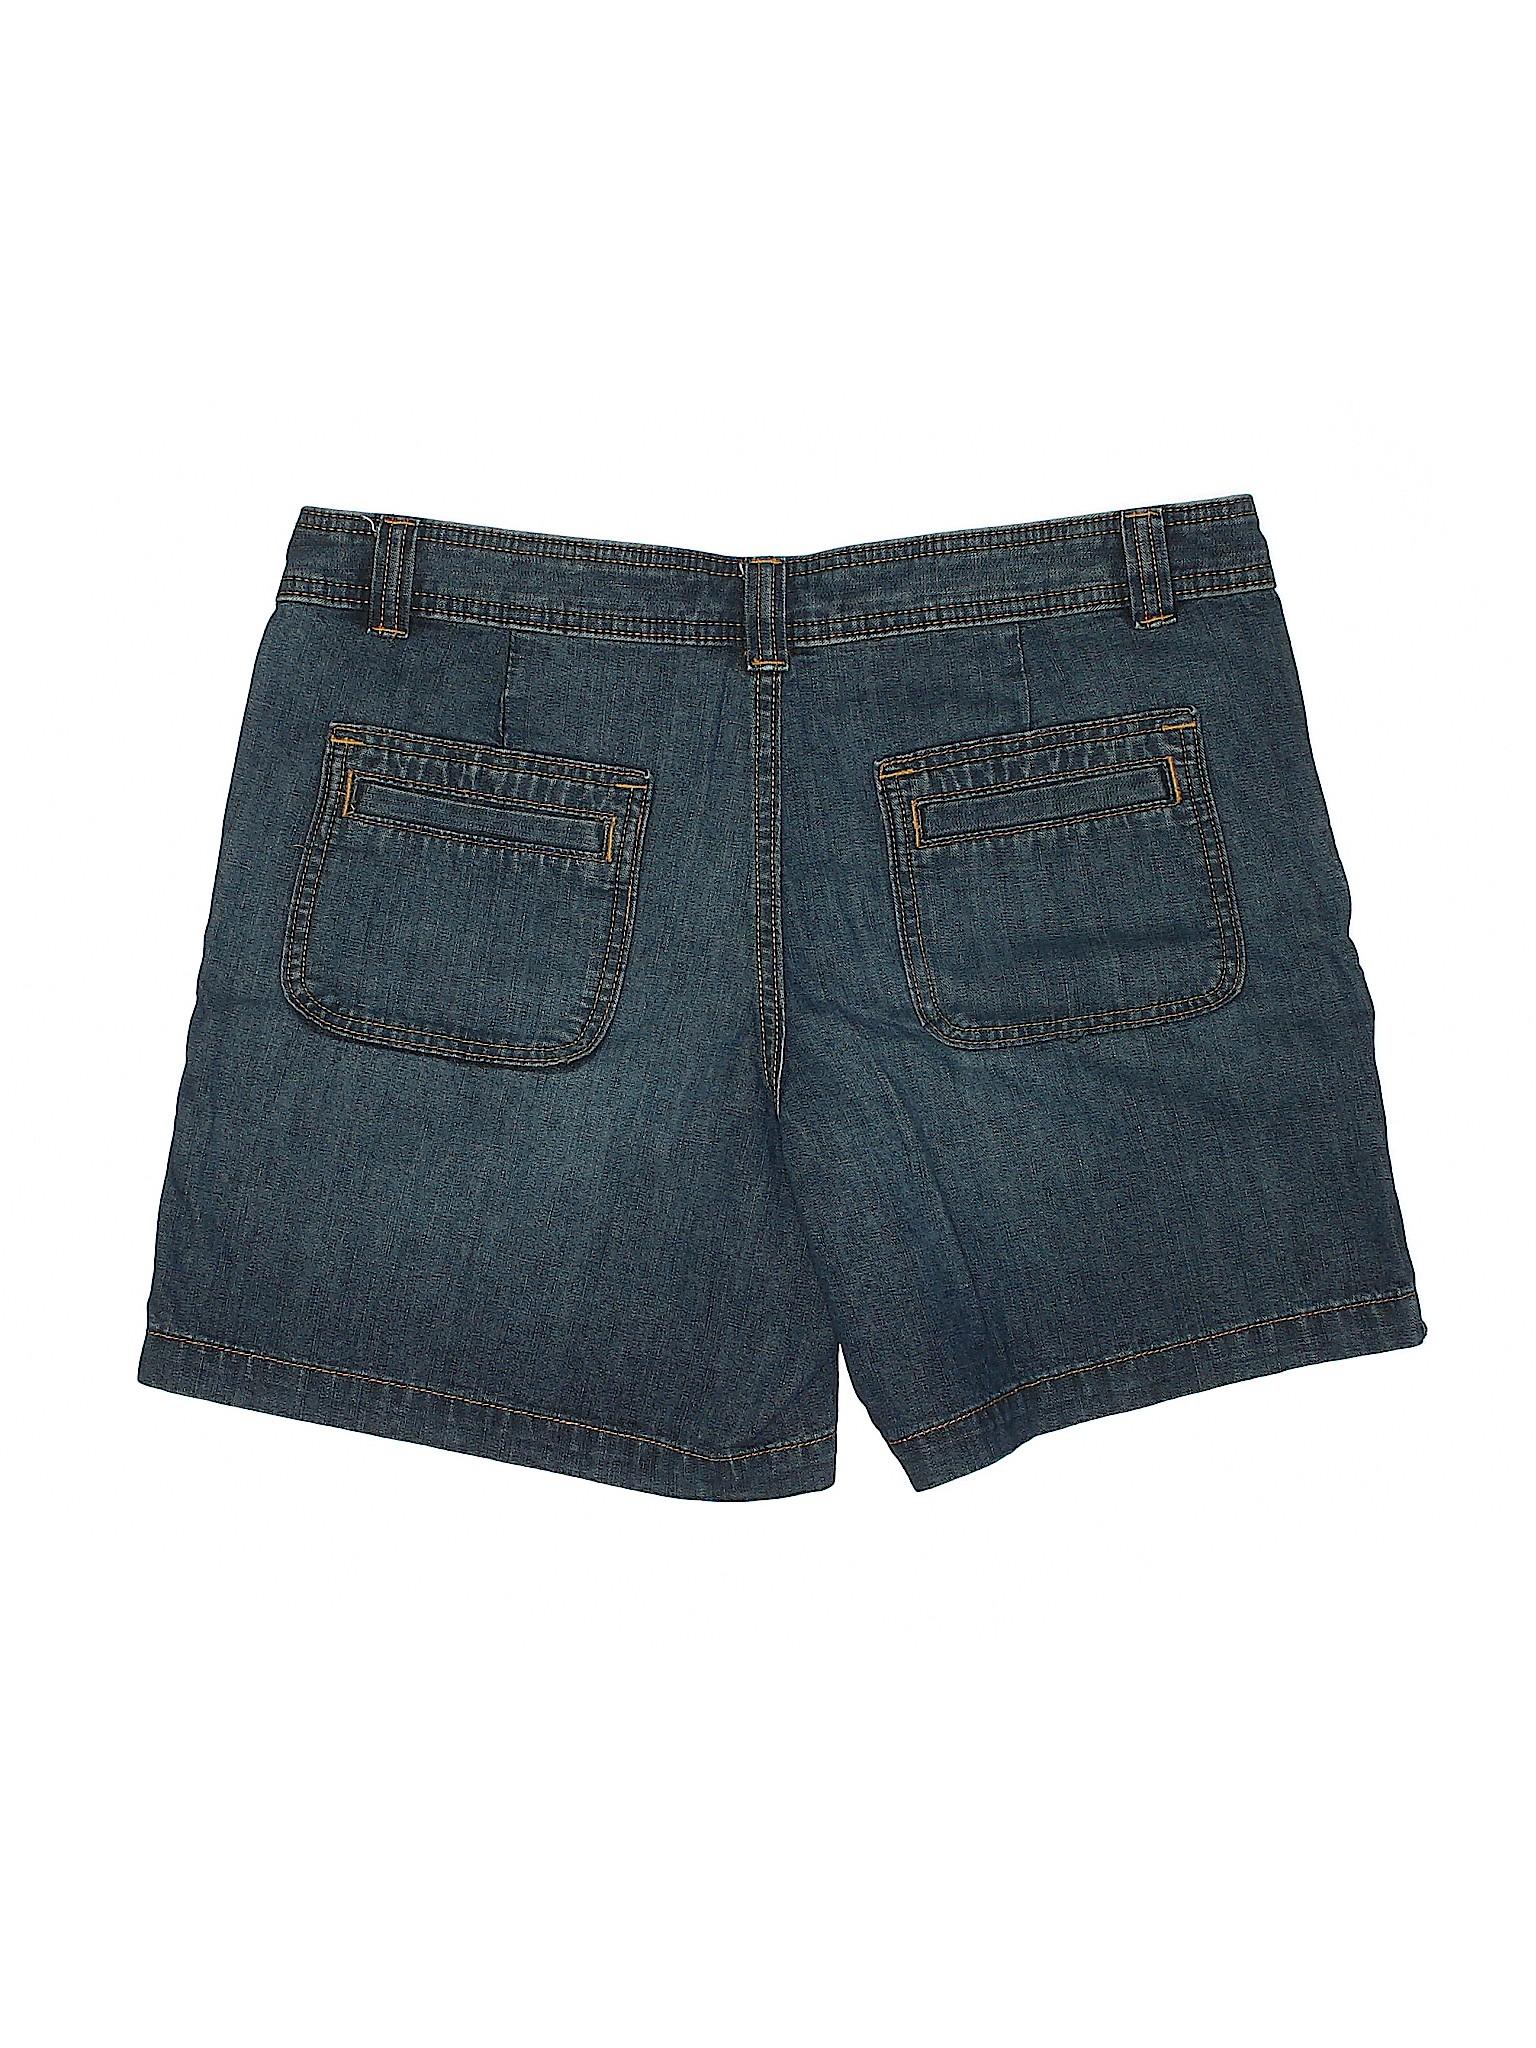 Old Boutique Old Navy Shorts Boutique Navy Denim CqPz4t